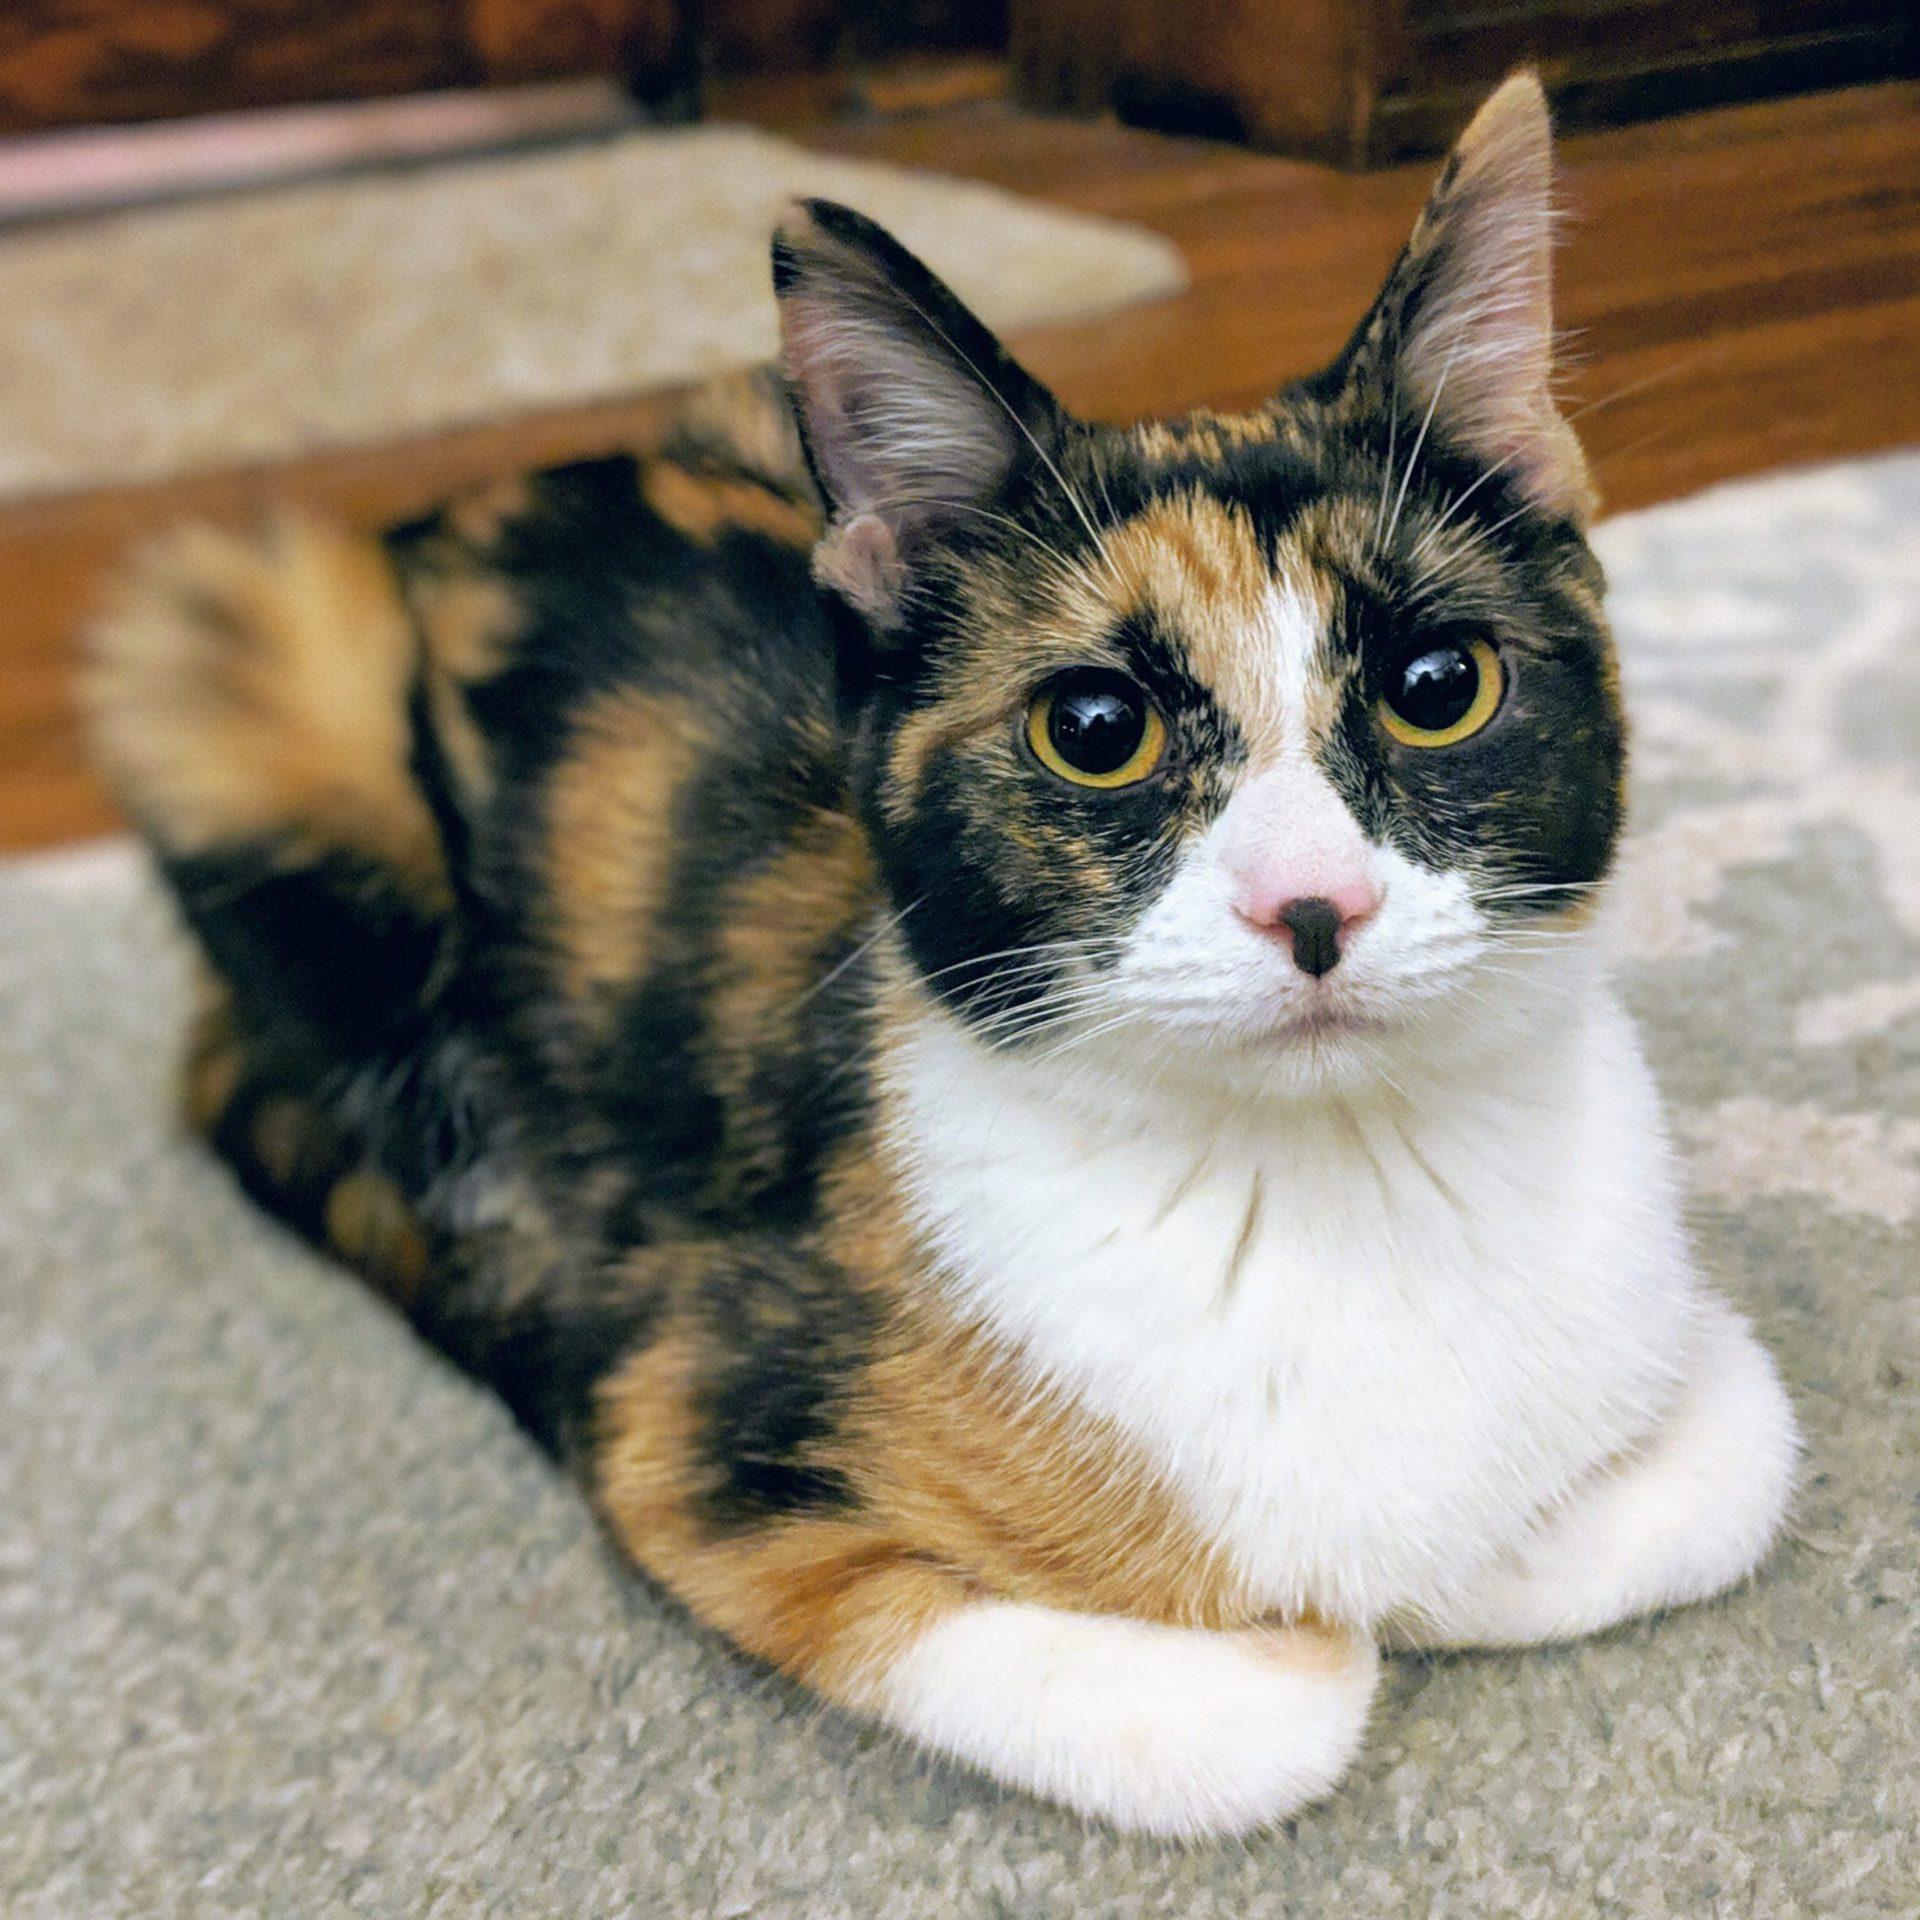 Calico kitten staring at the camera